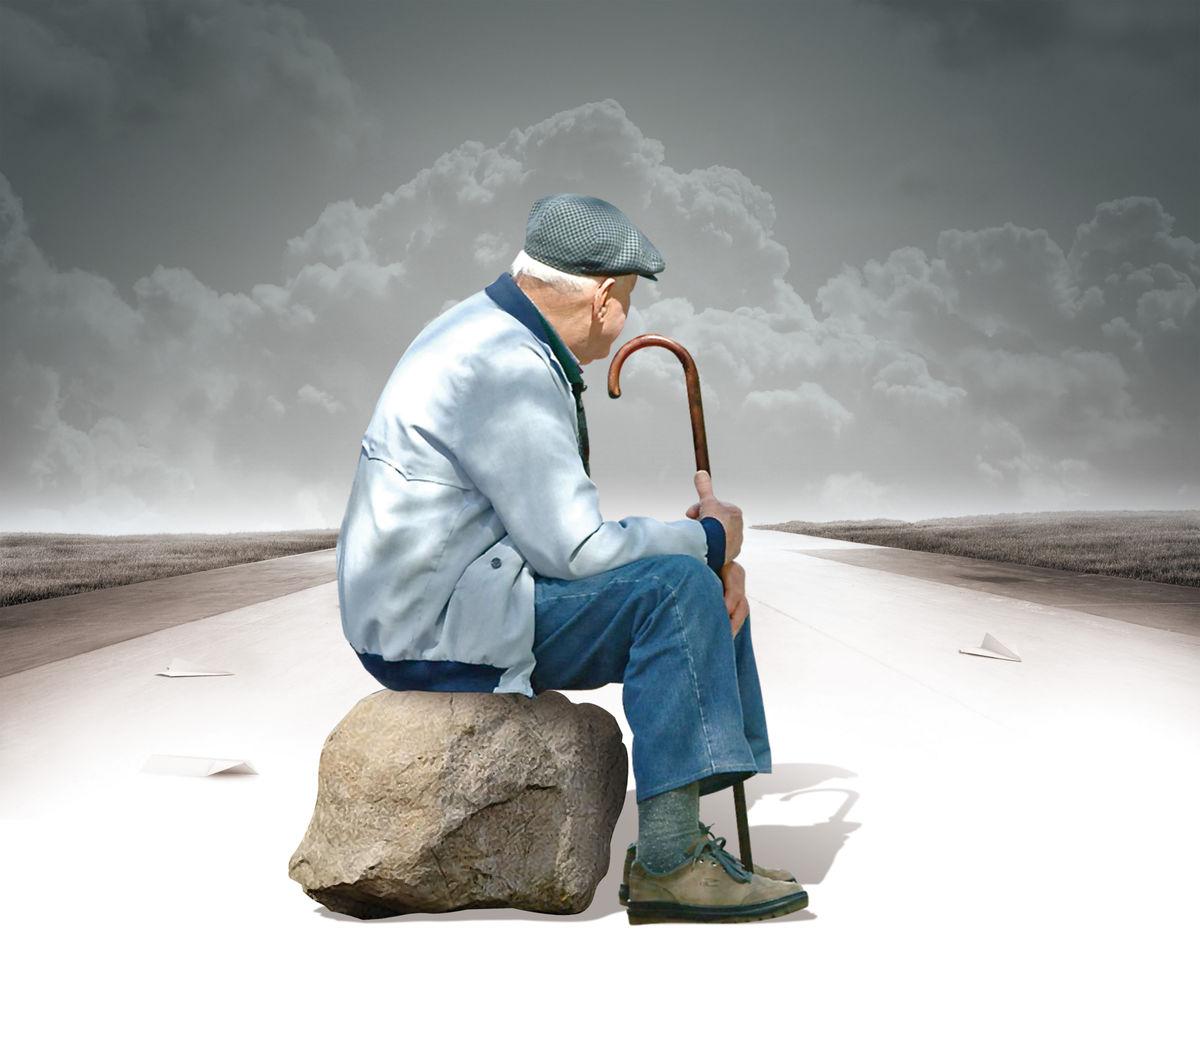 تدابیر تامین سلامتی سالمندان